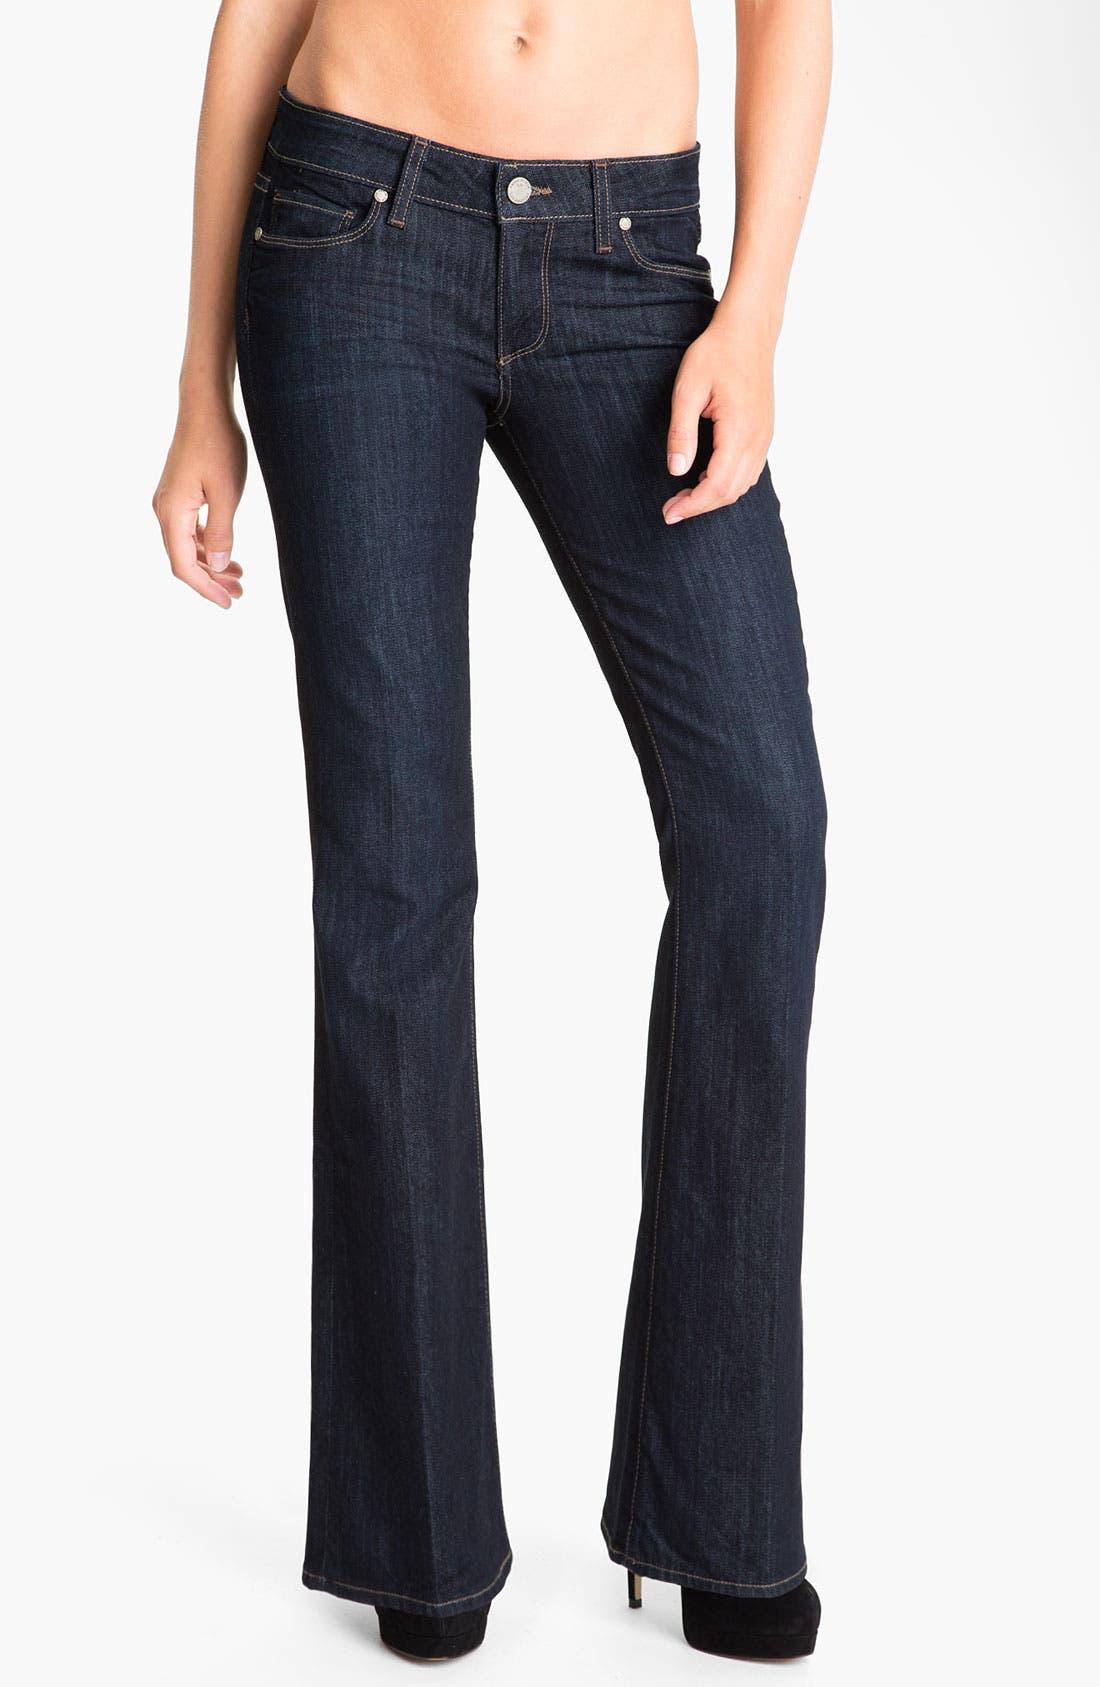 Alternate Image 1 Selected - Paige Denim 'Skyline' Bootcut Jeans (Dream) (Petite)